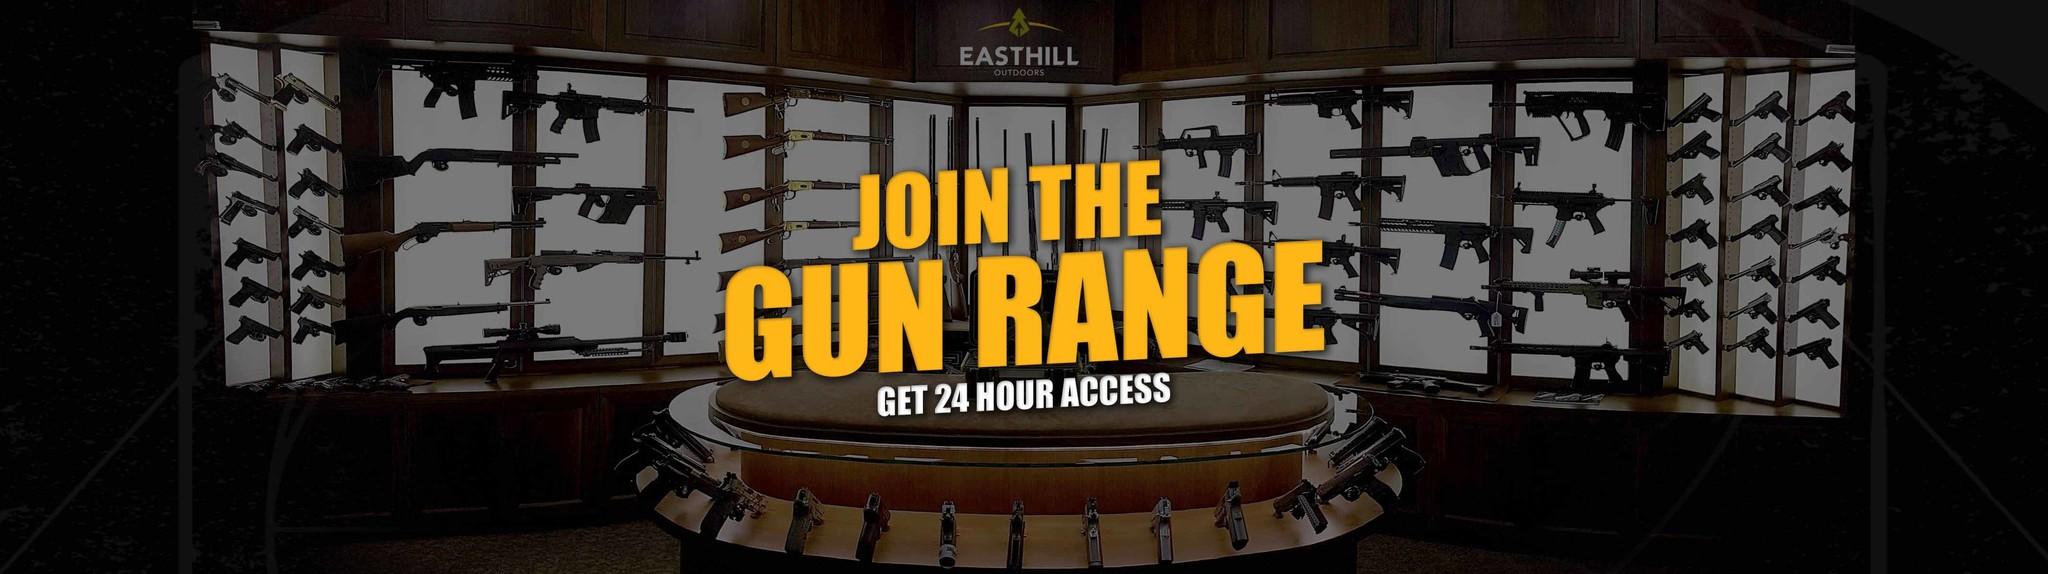 Join Gun Range